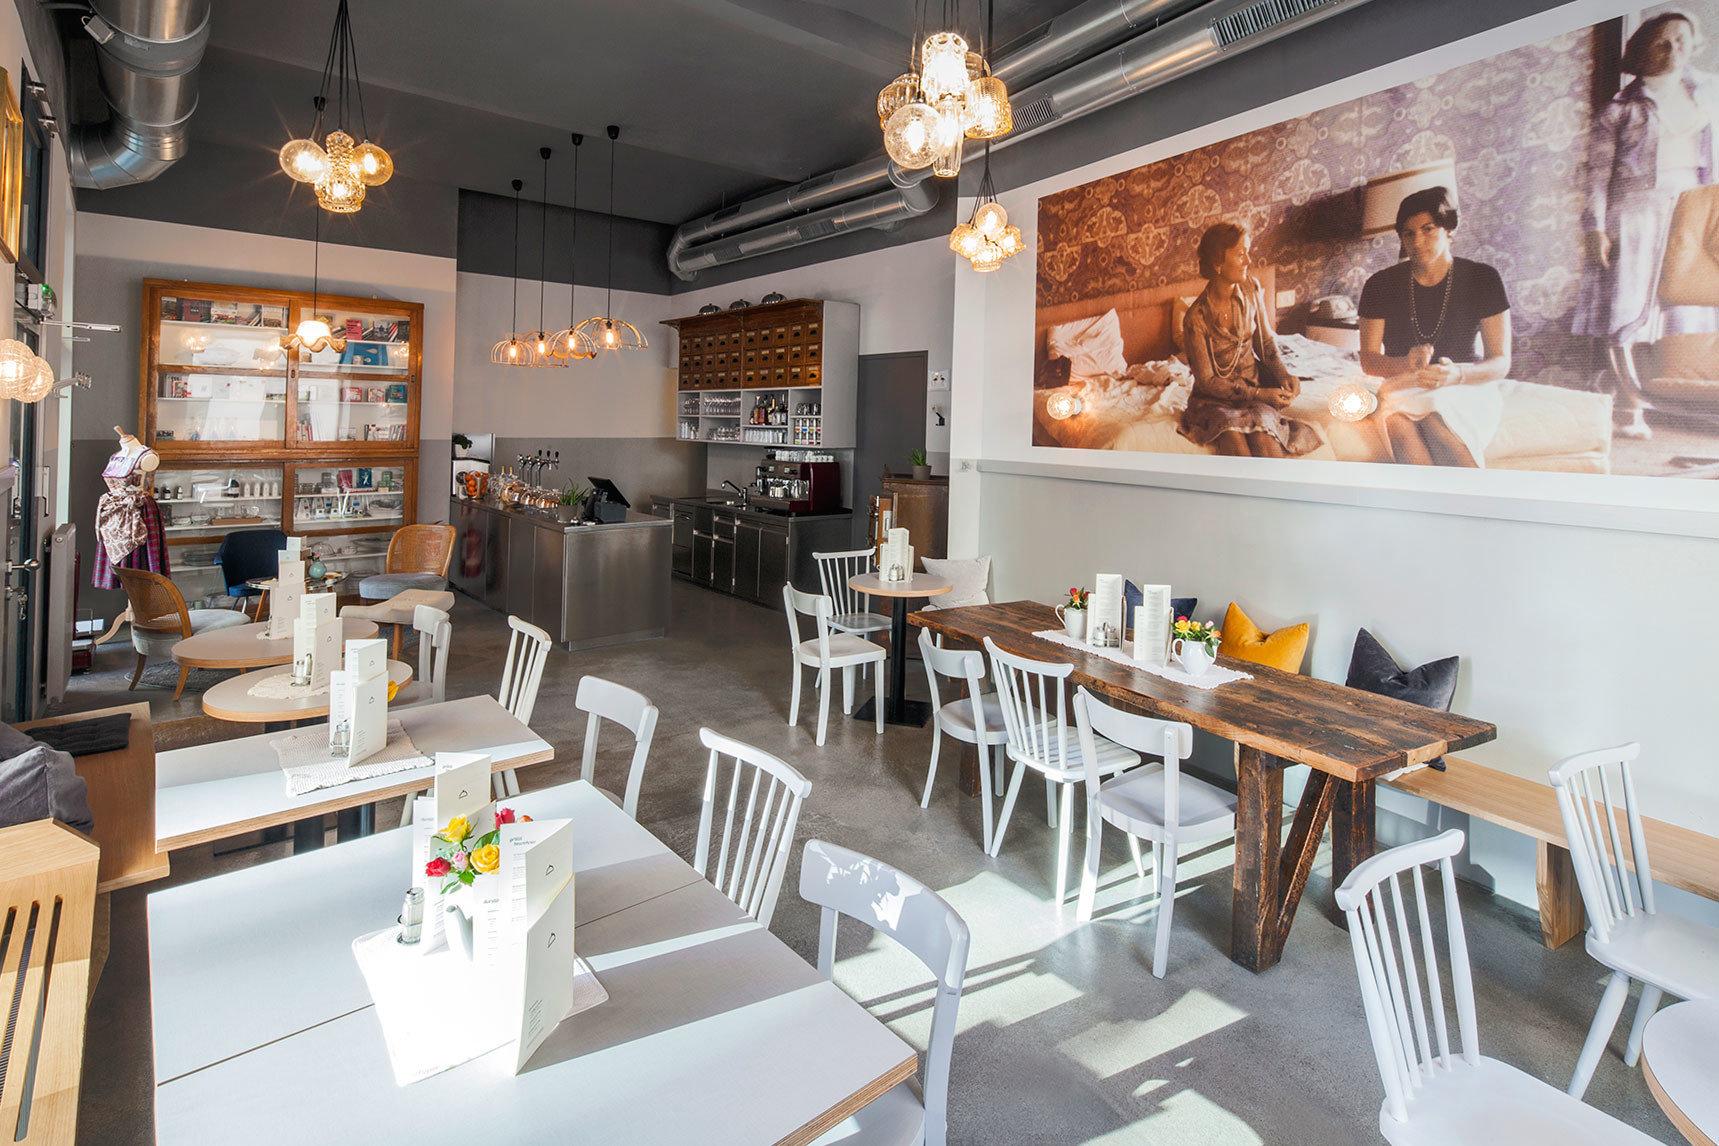 property restaurant café cafeteria food brunch cuisine dining table